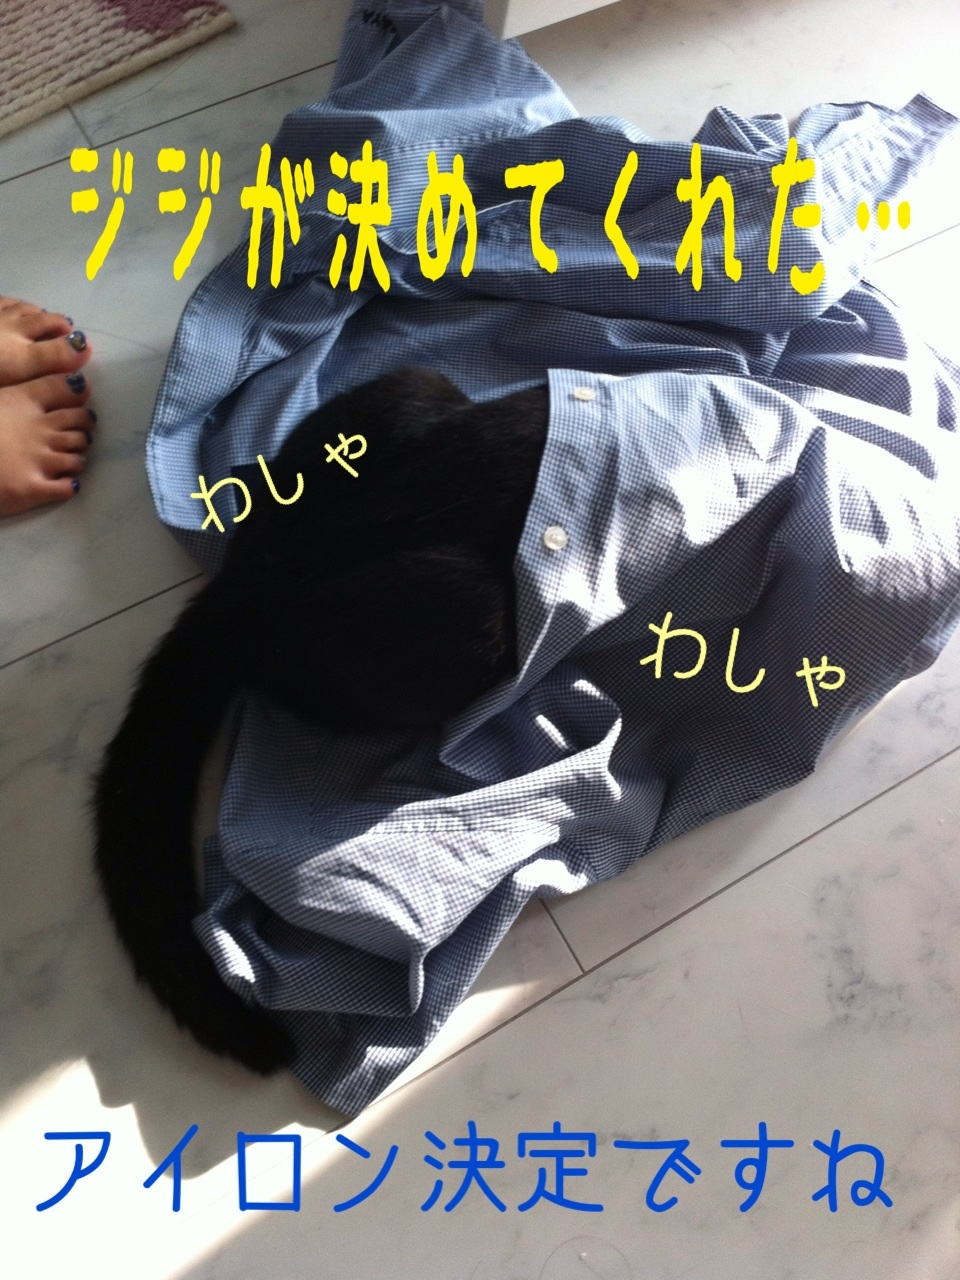 image_201308022348410b5.jpg